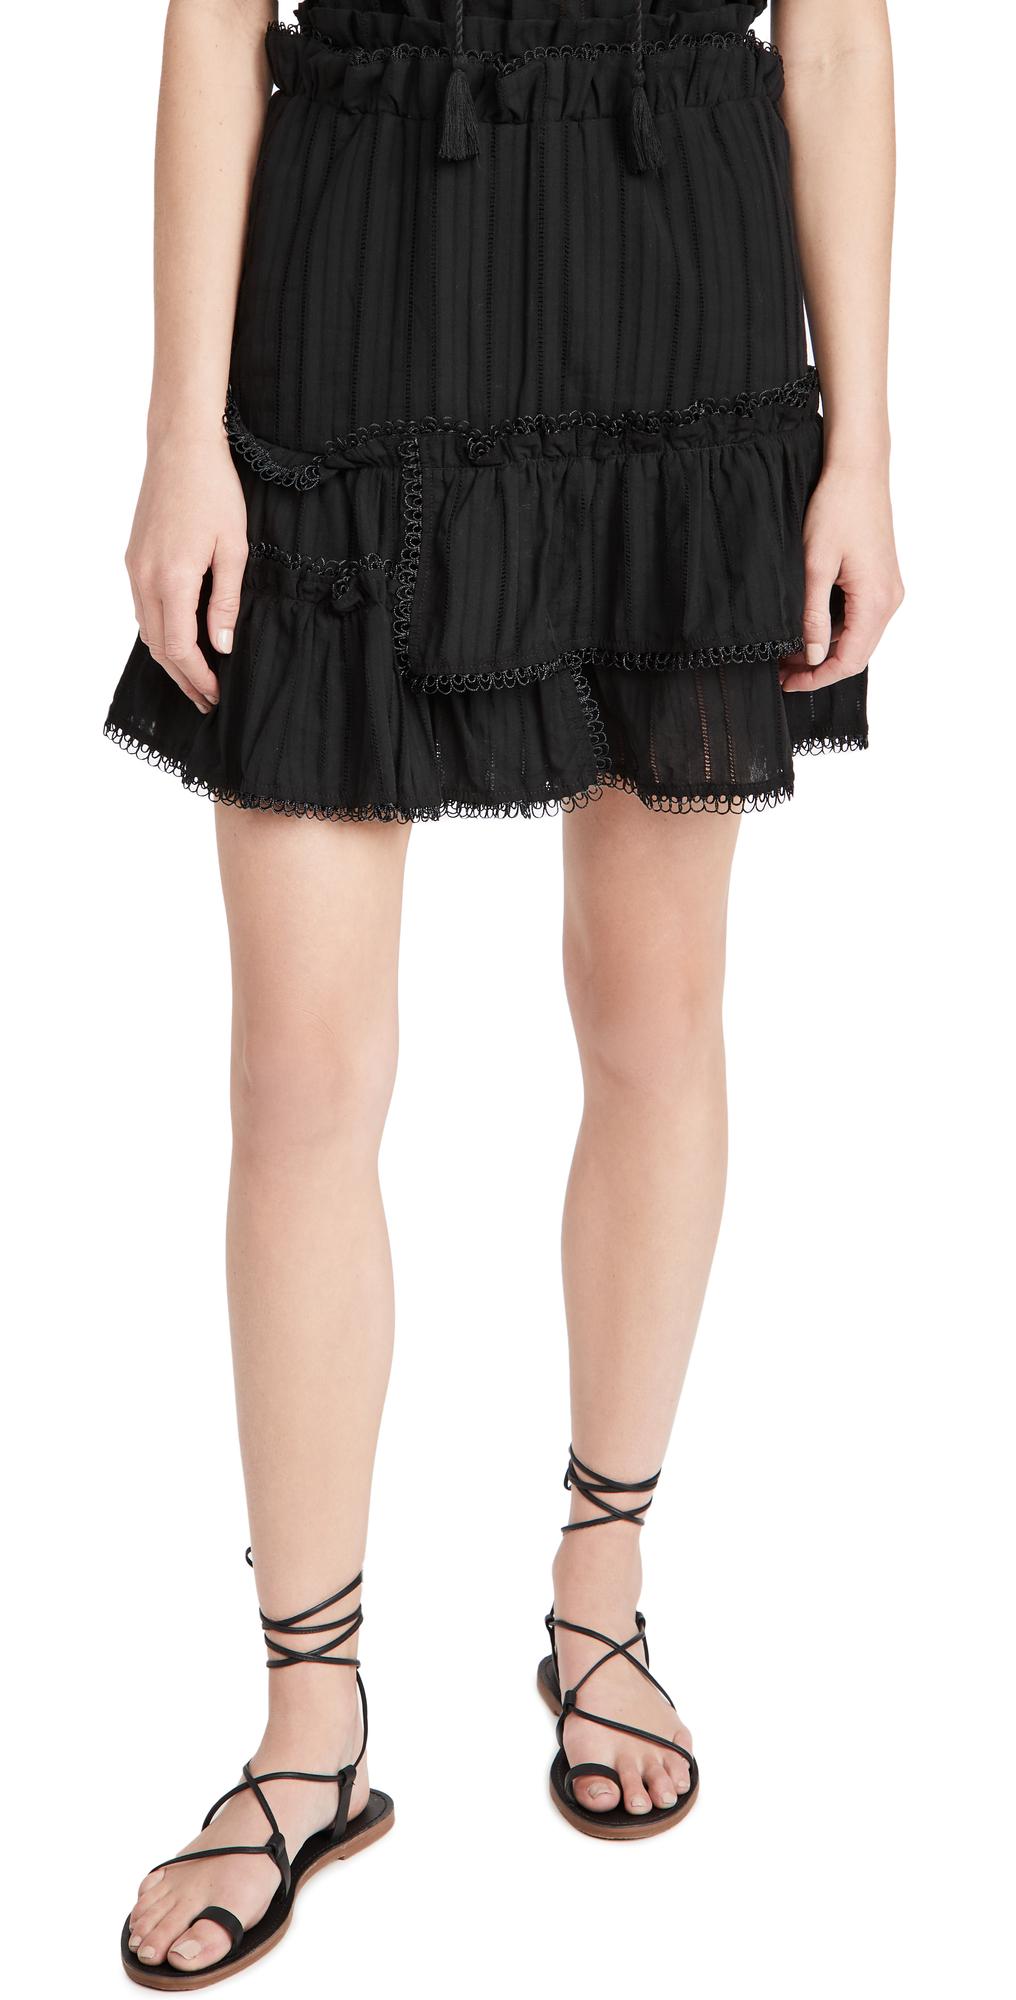 Pescara Skirt